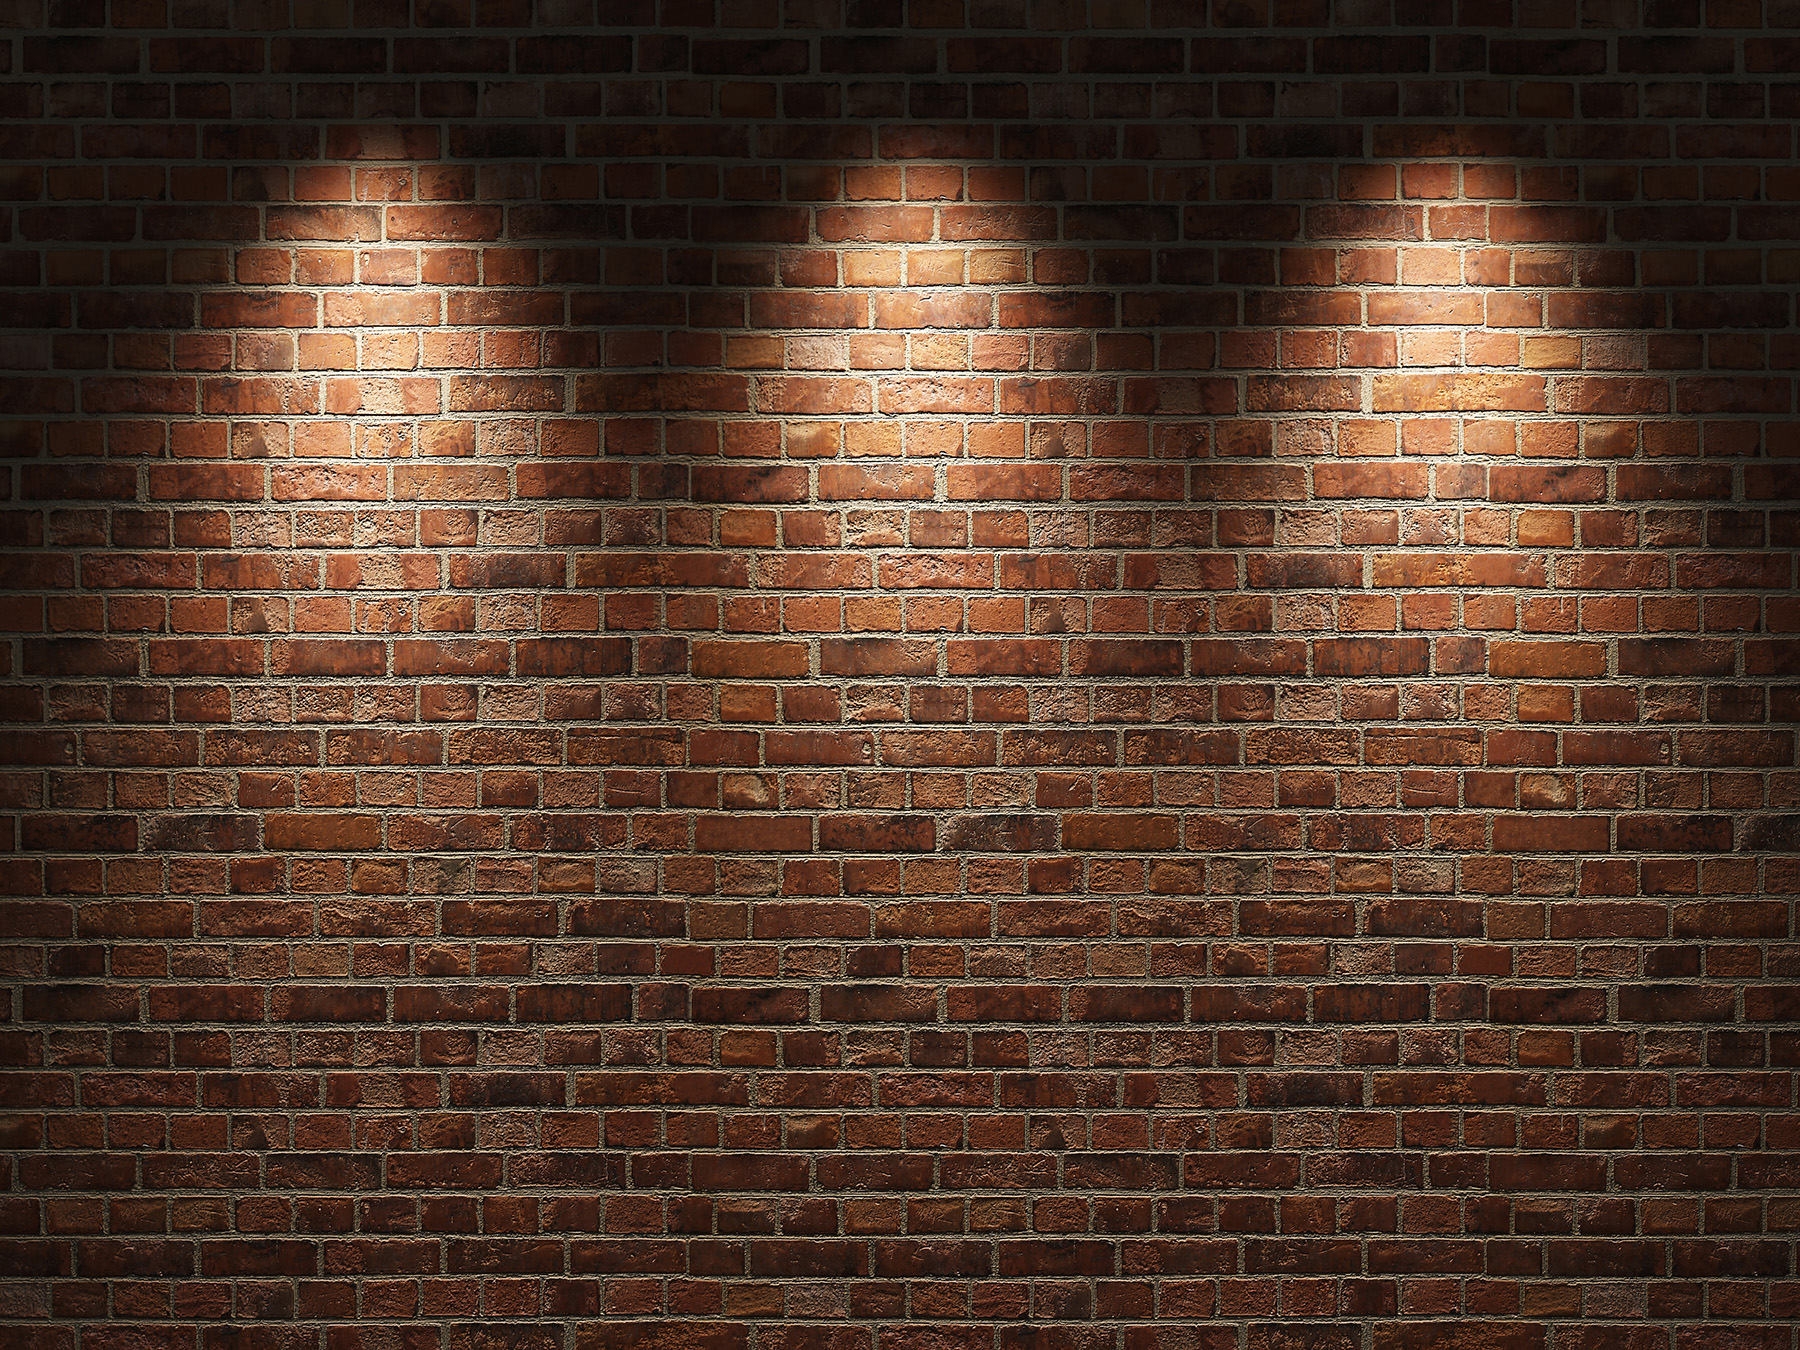 Brick Wall With Spotlight - Man Cave Brick Wall - HD Wallpaper